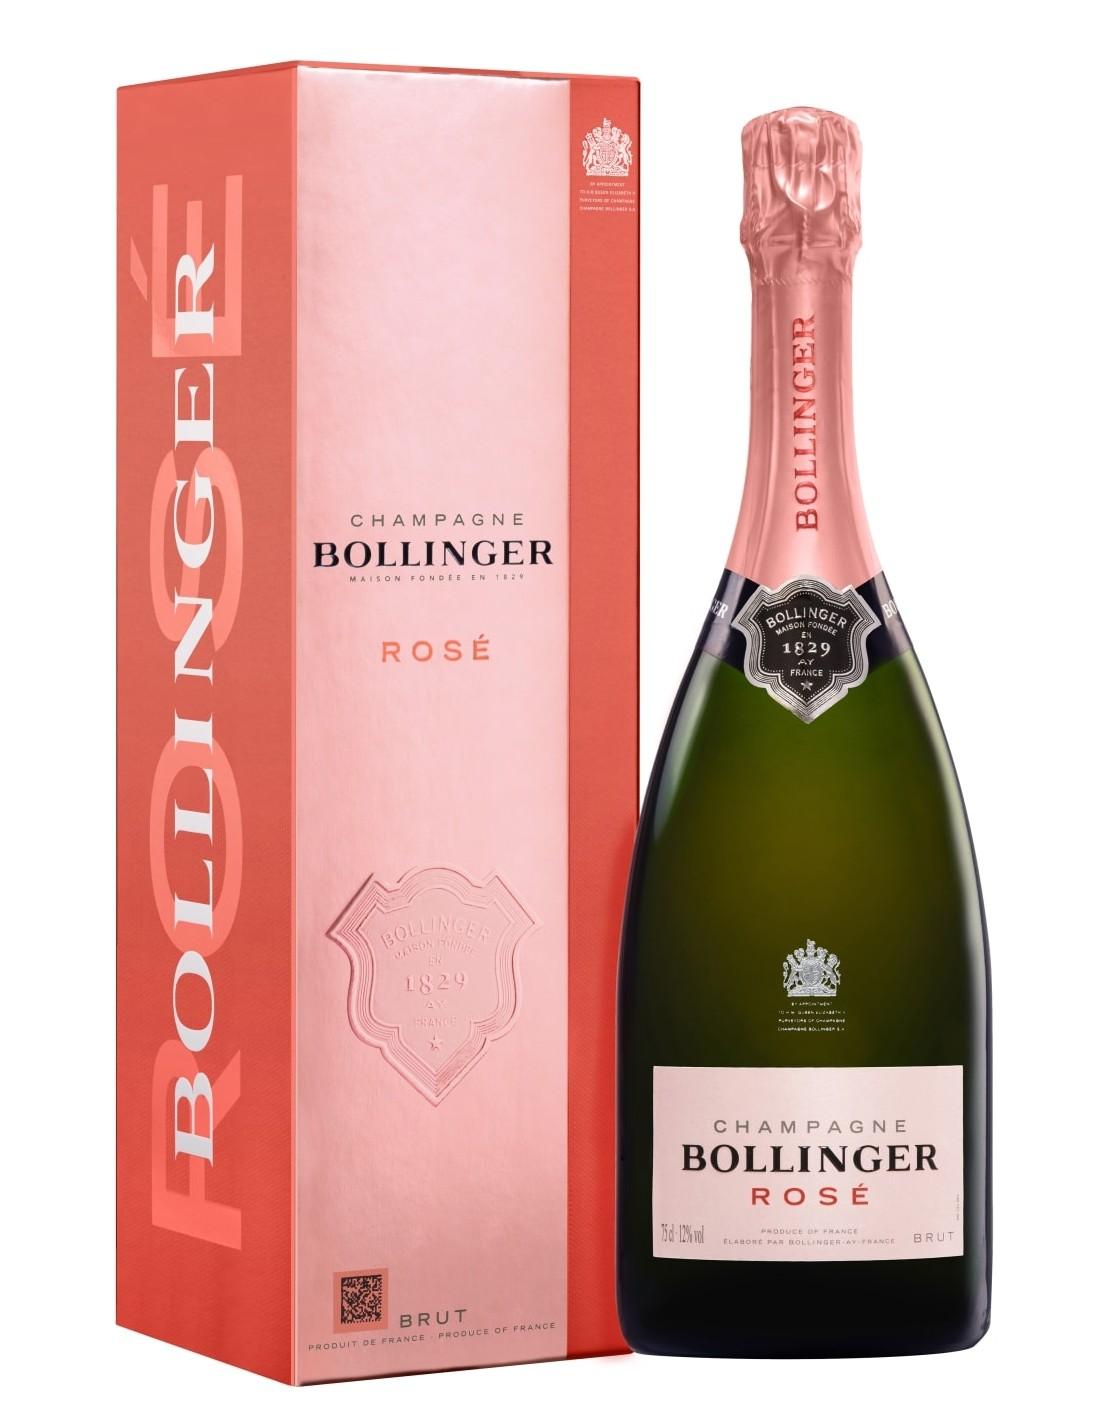 Sampanie Bollinger Rose Brut Champagne, 12% alc. 0.75L, Franta